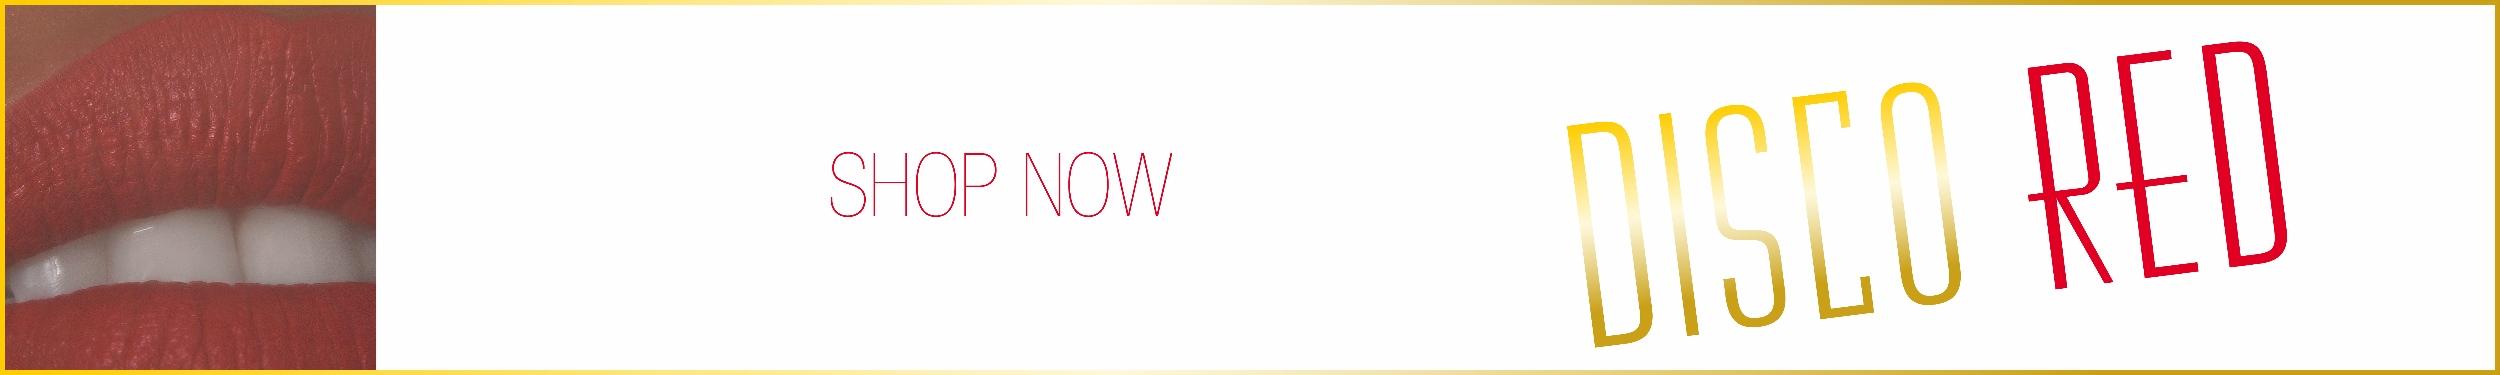 BANNER DISCO RED (2500x375).jpg